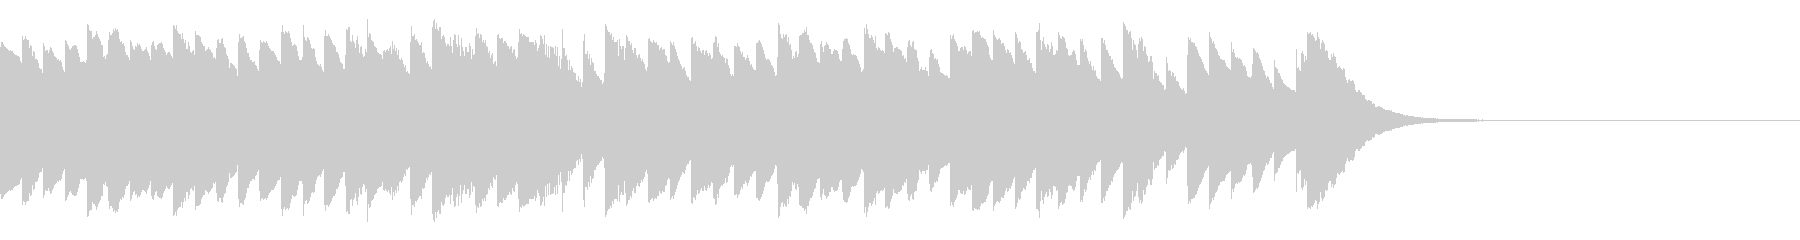 Music box Good night Winter Jingle logo's unreproduced waveform